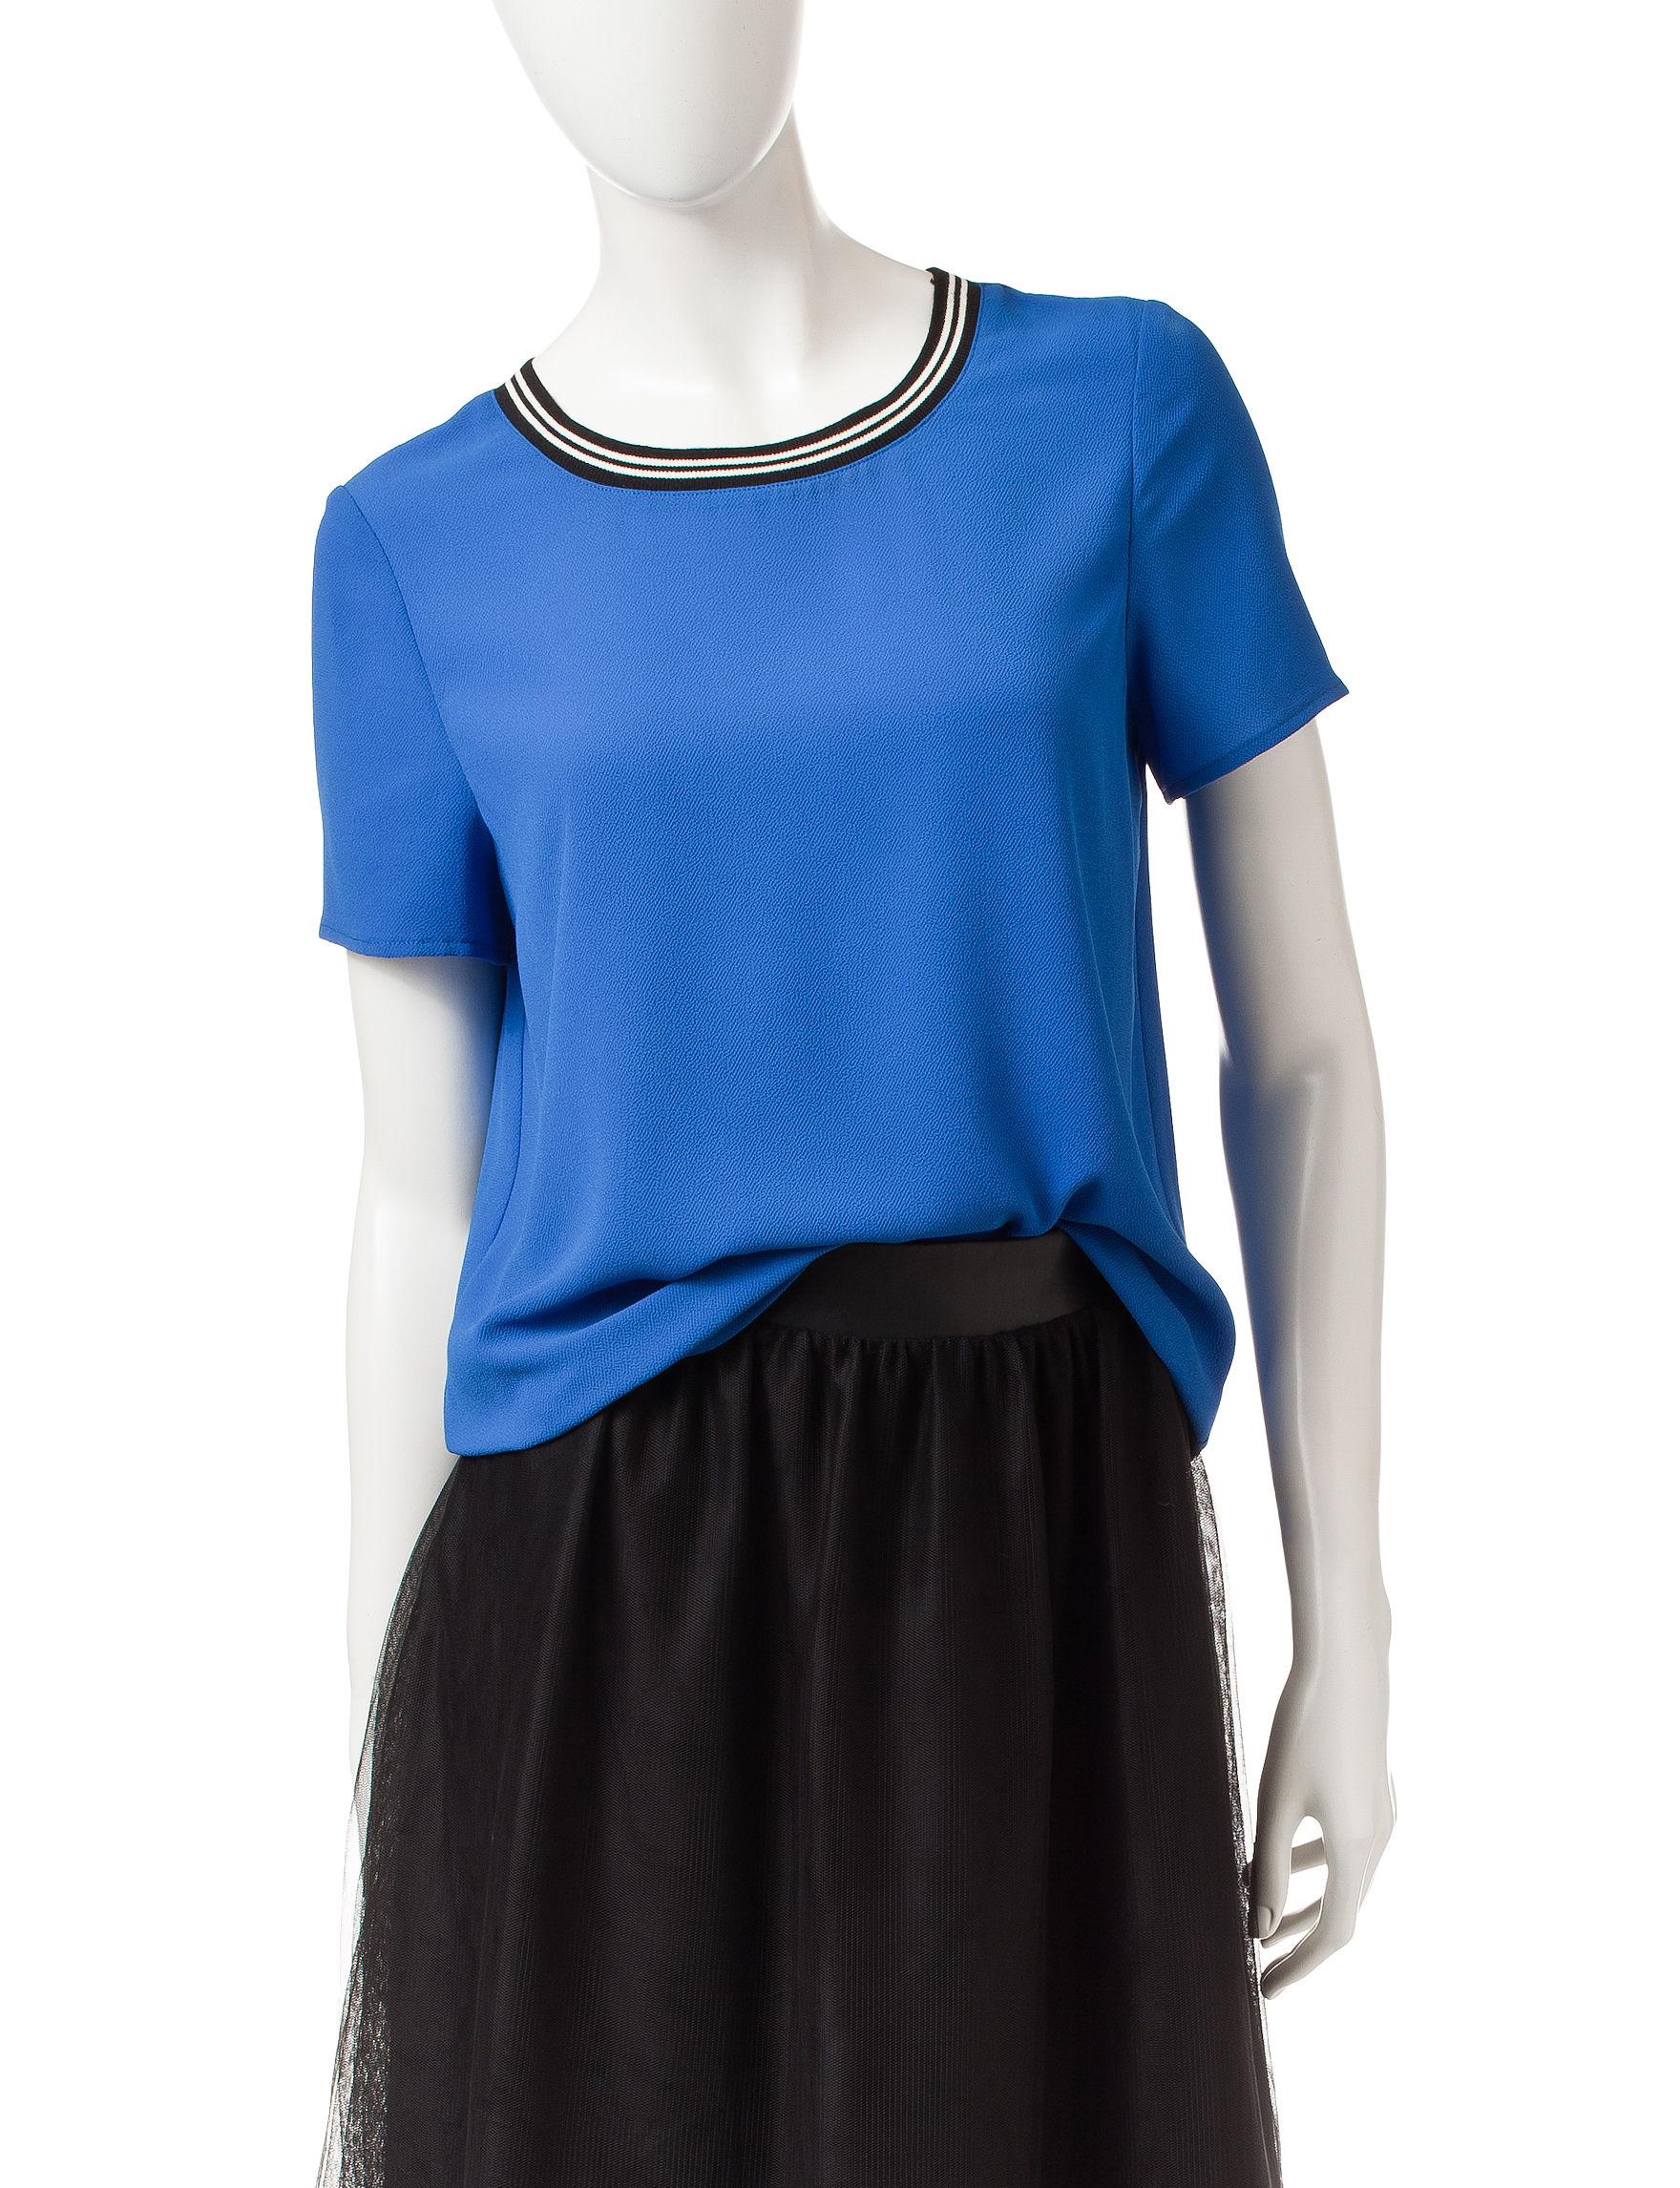 Kensie Ivory Shirts & Blouses